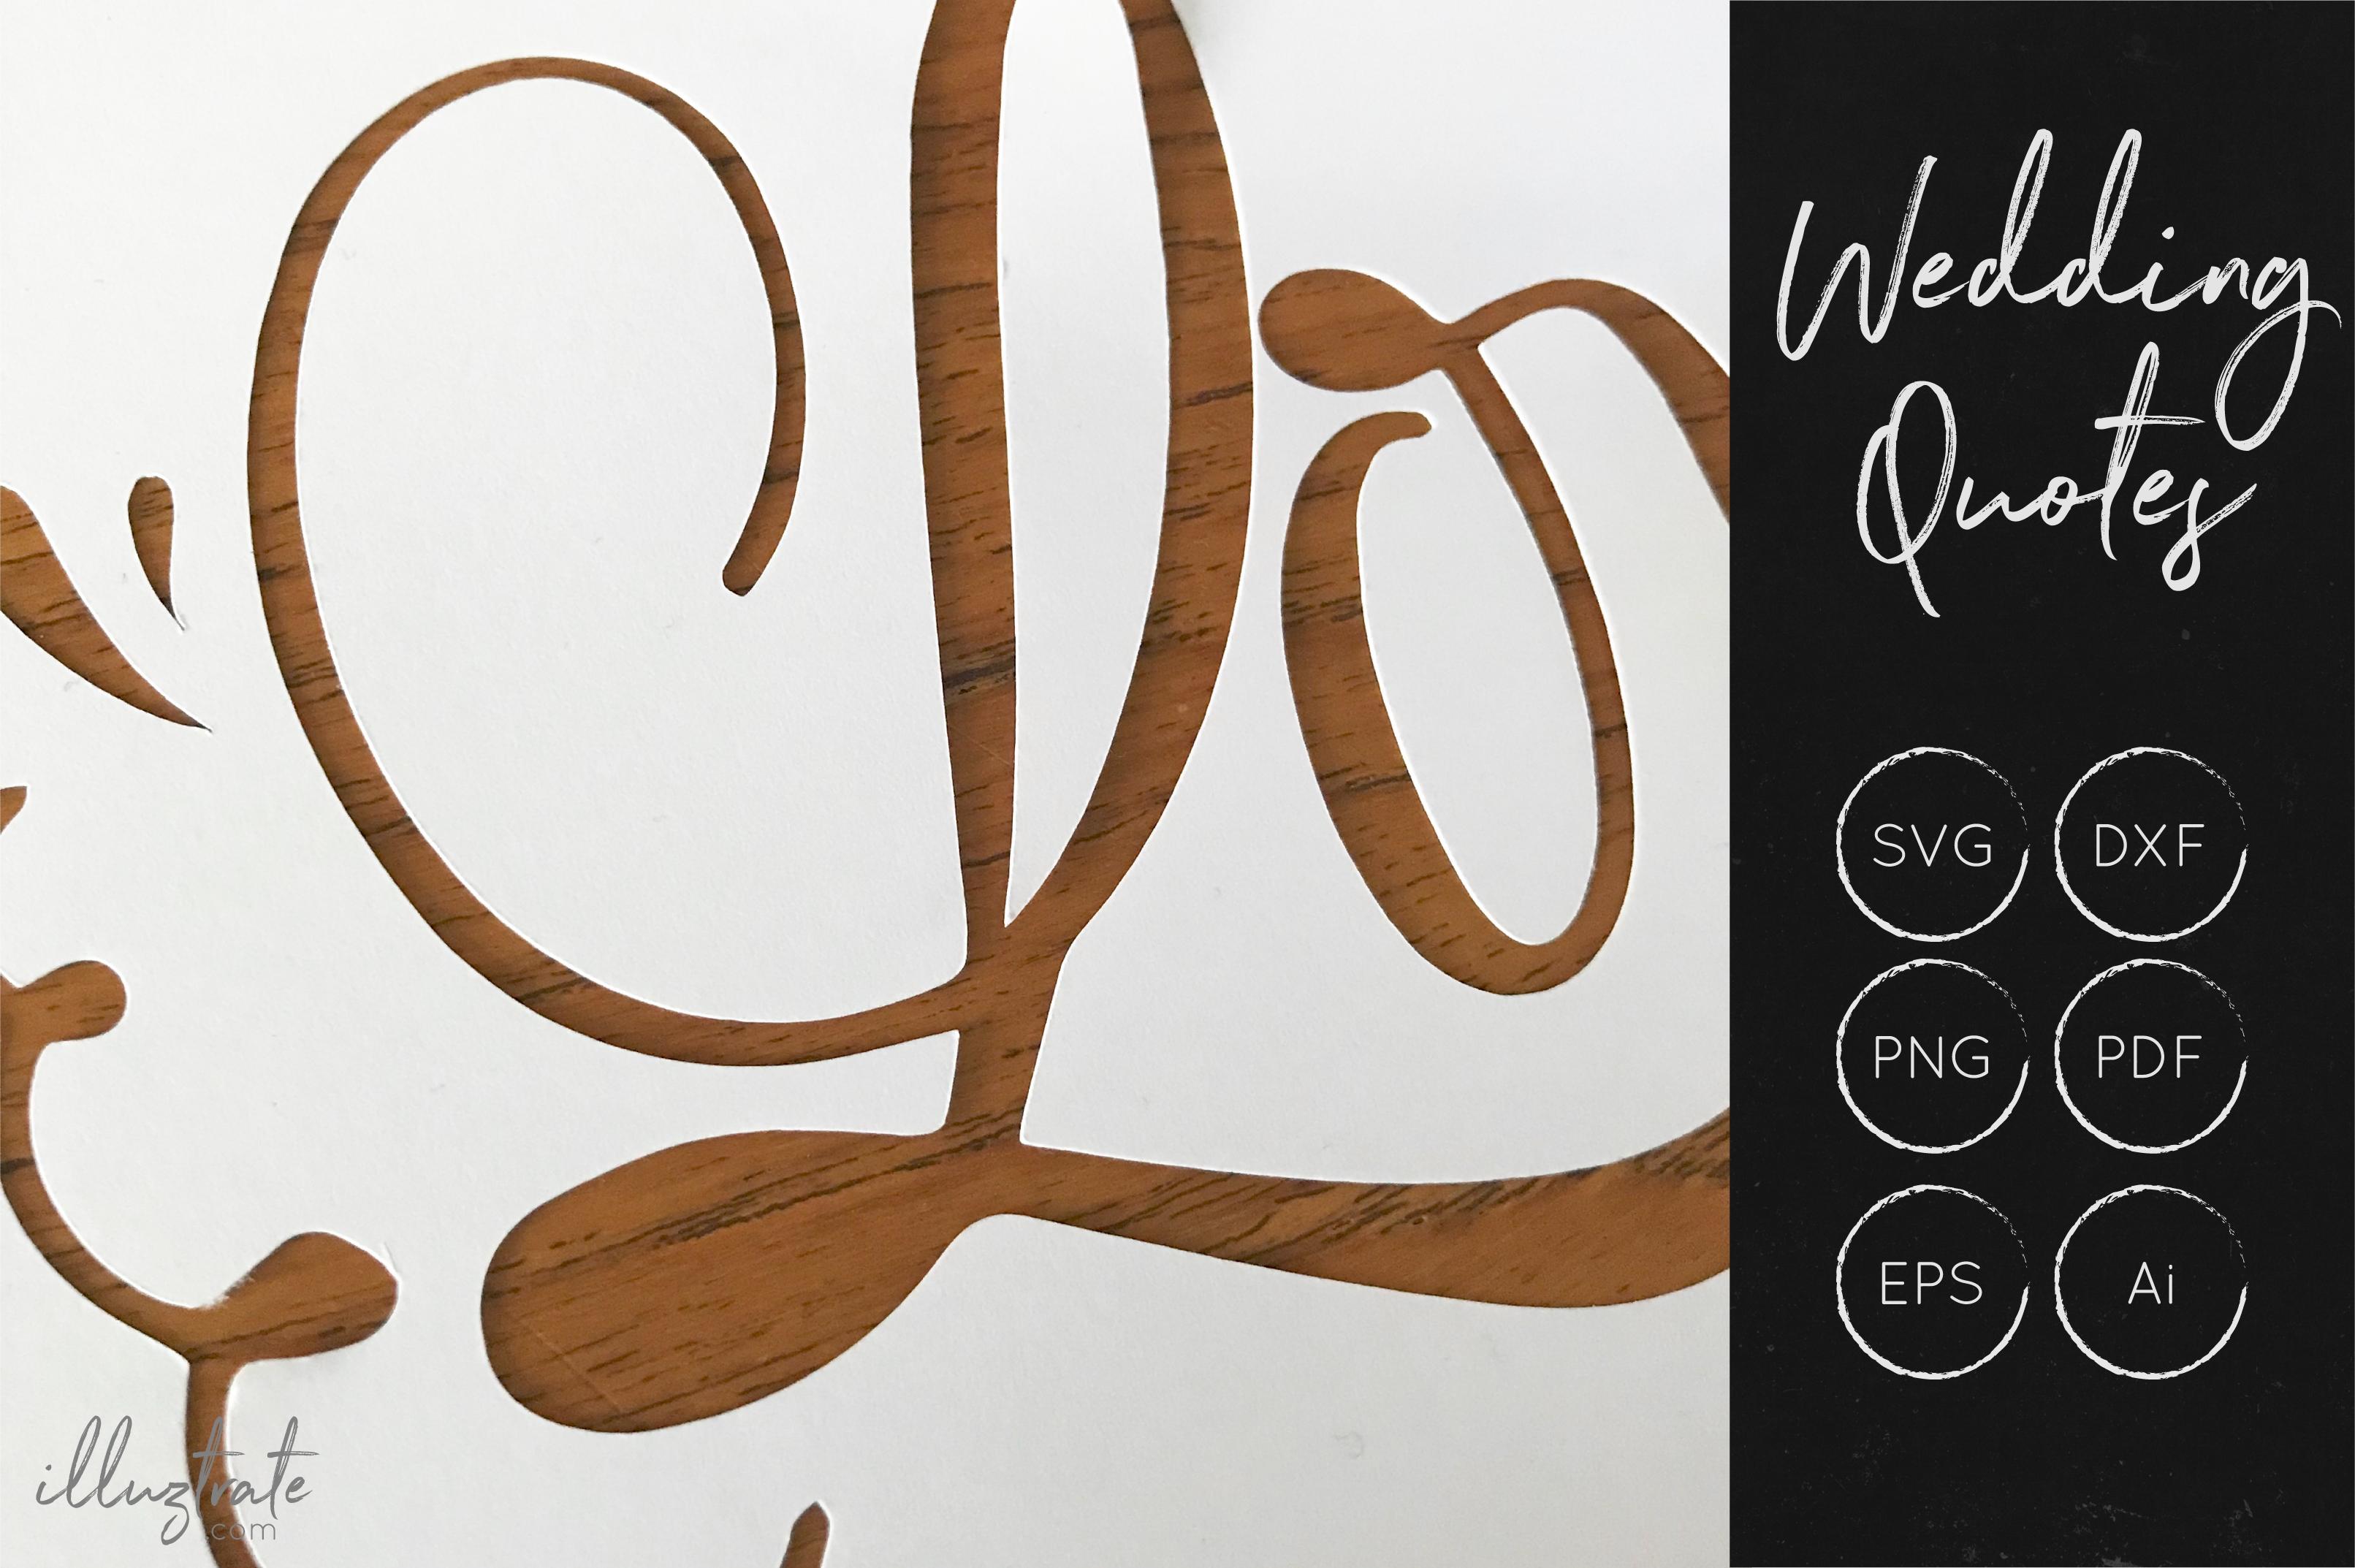 Wedding SVG Cut Files Bundle - Wedding Quotes - Wedding SVG example image 7